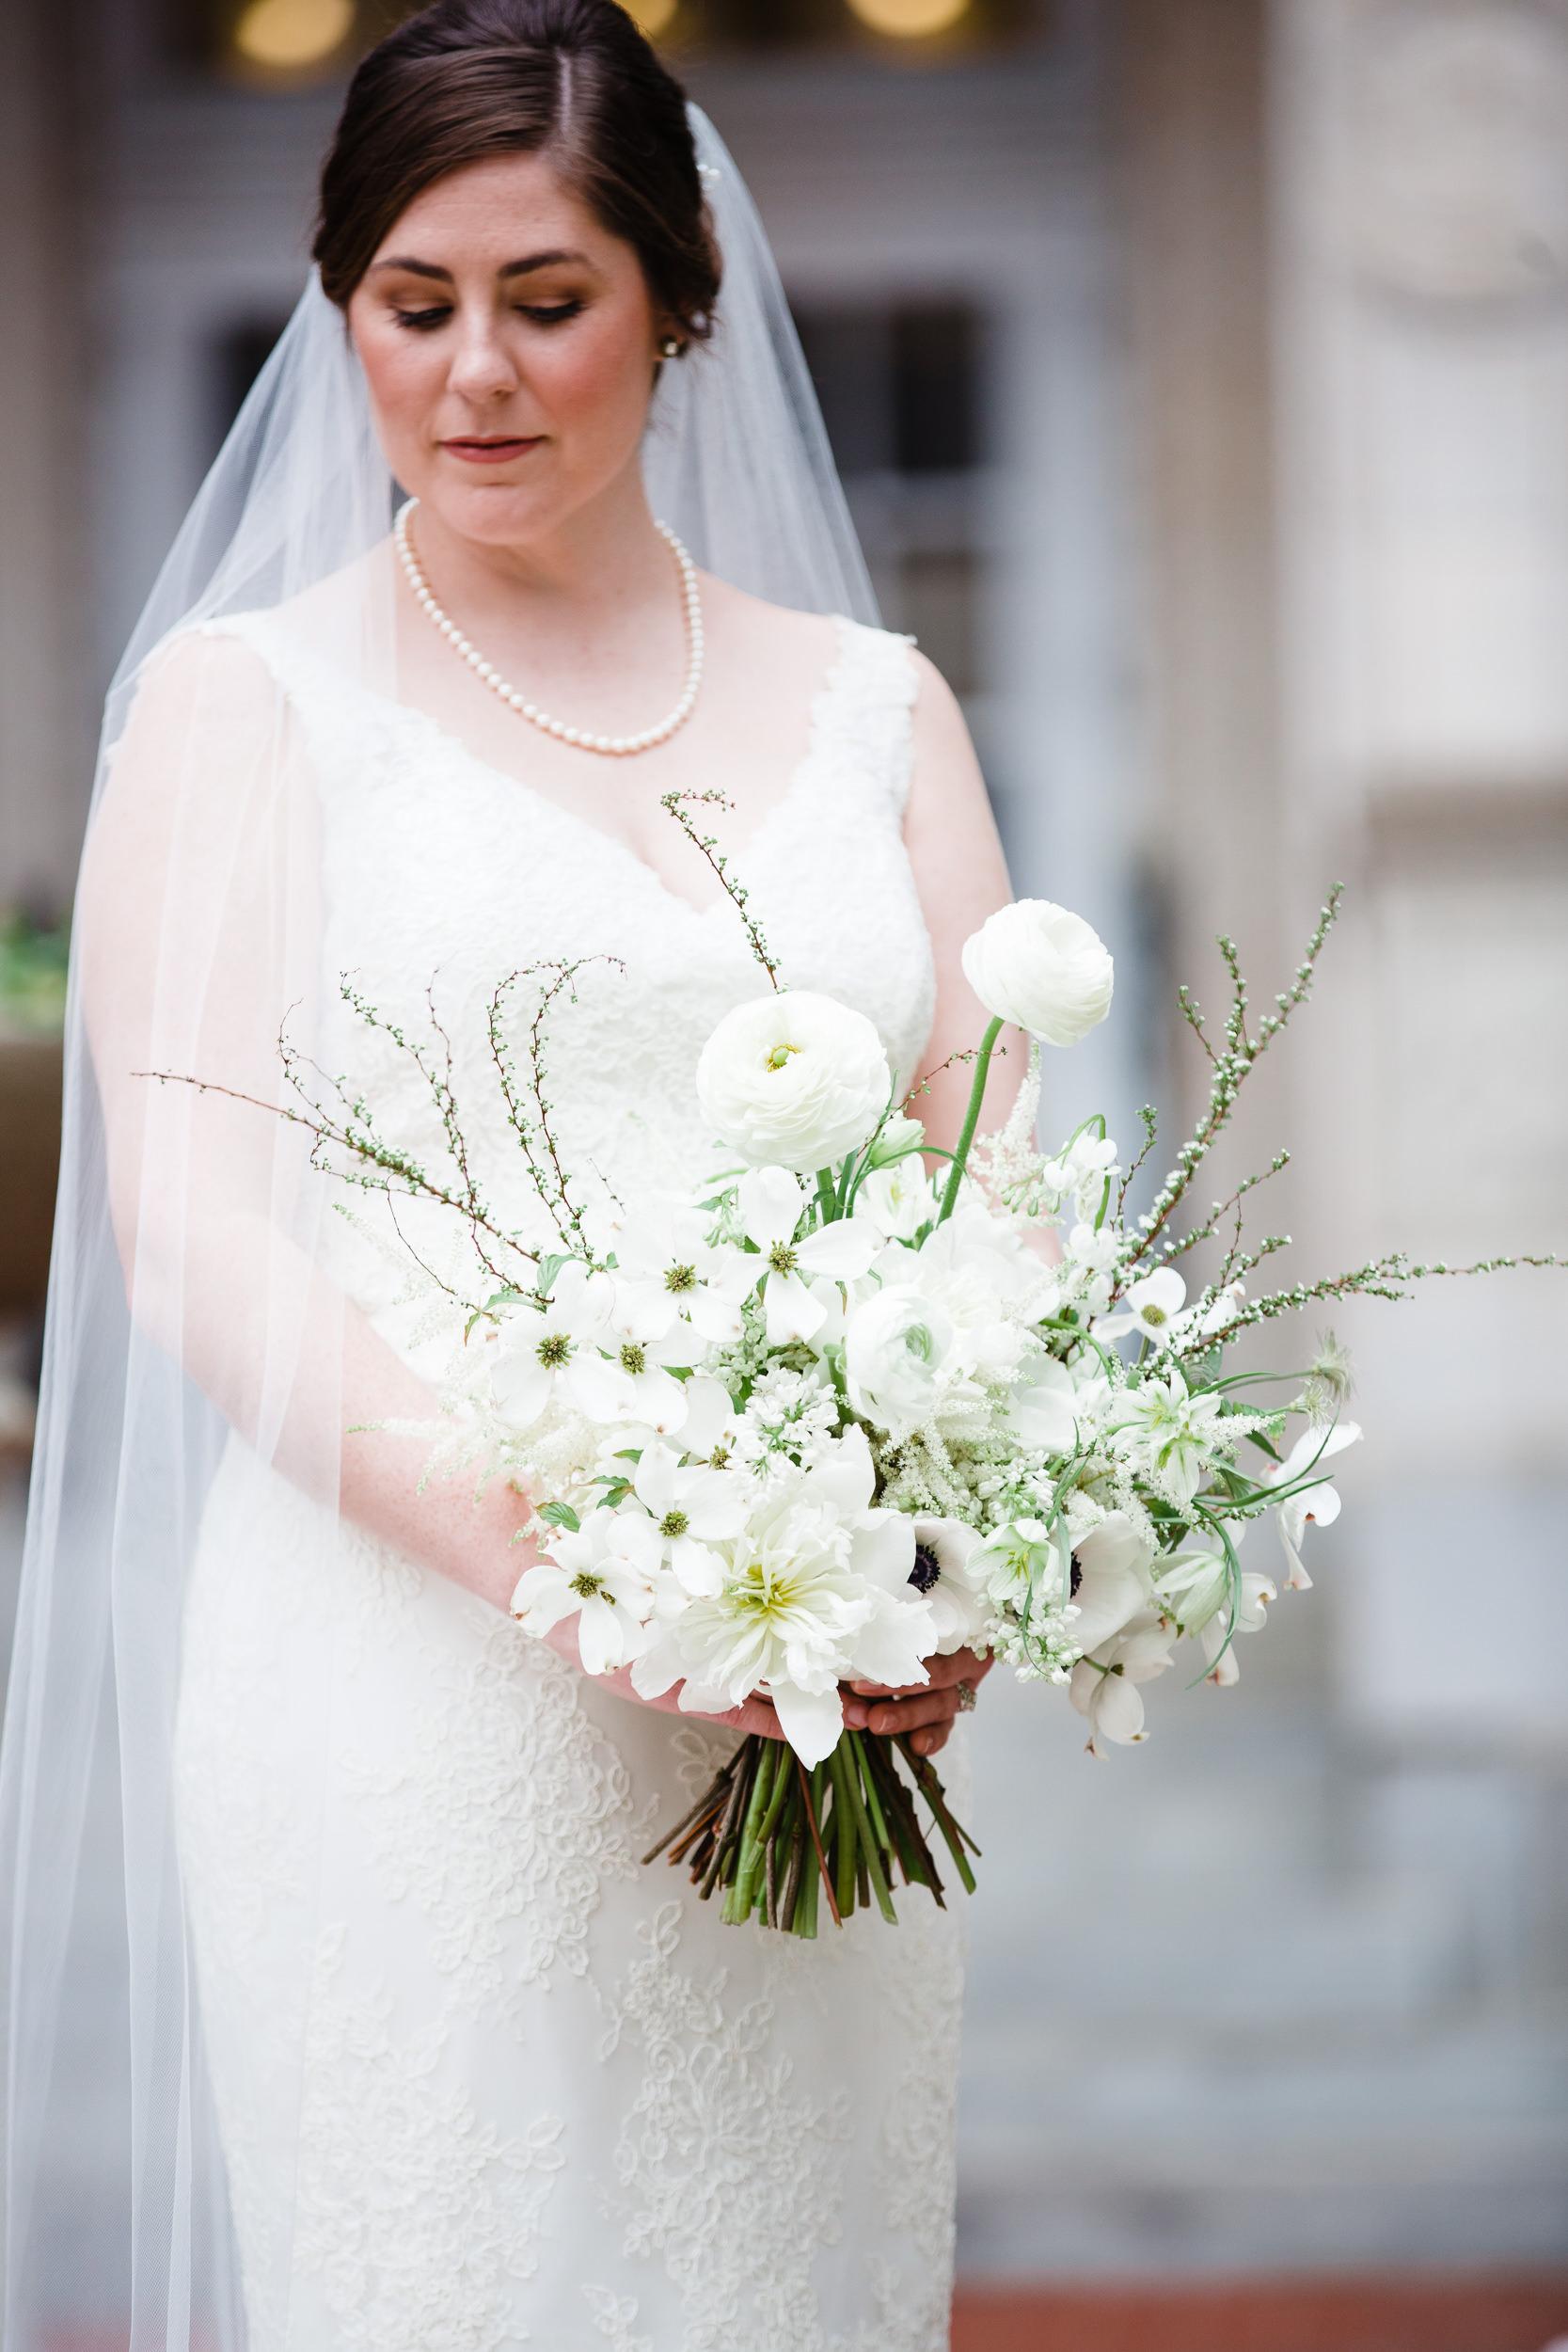 LK_Birmingham_AL_Wedding_2019-00019.jpg